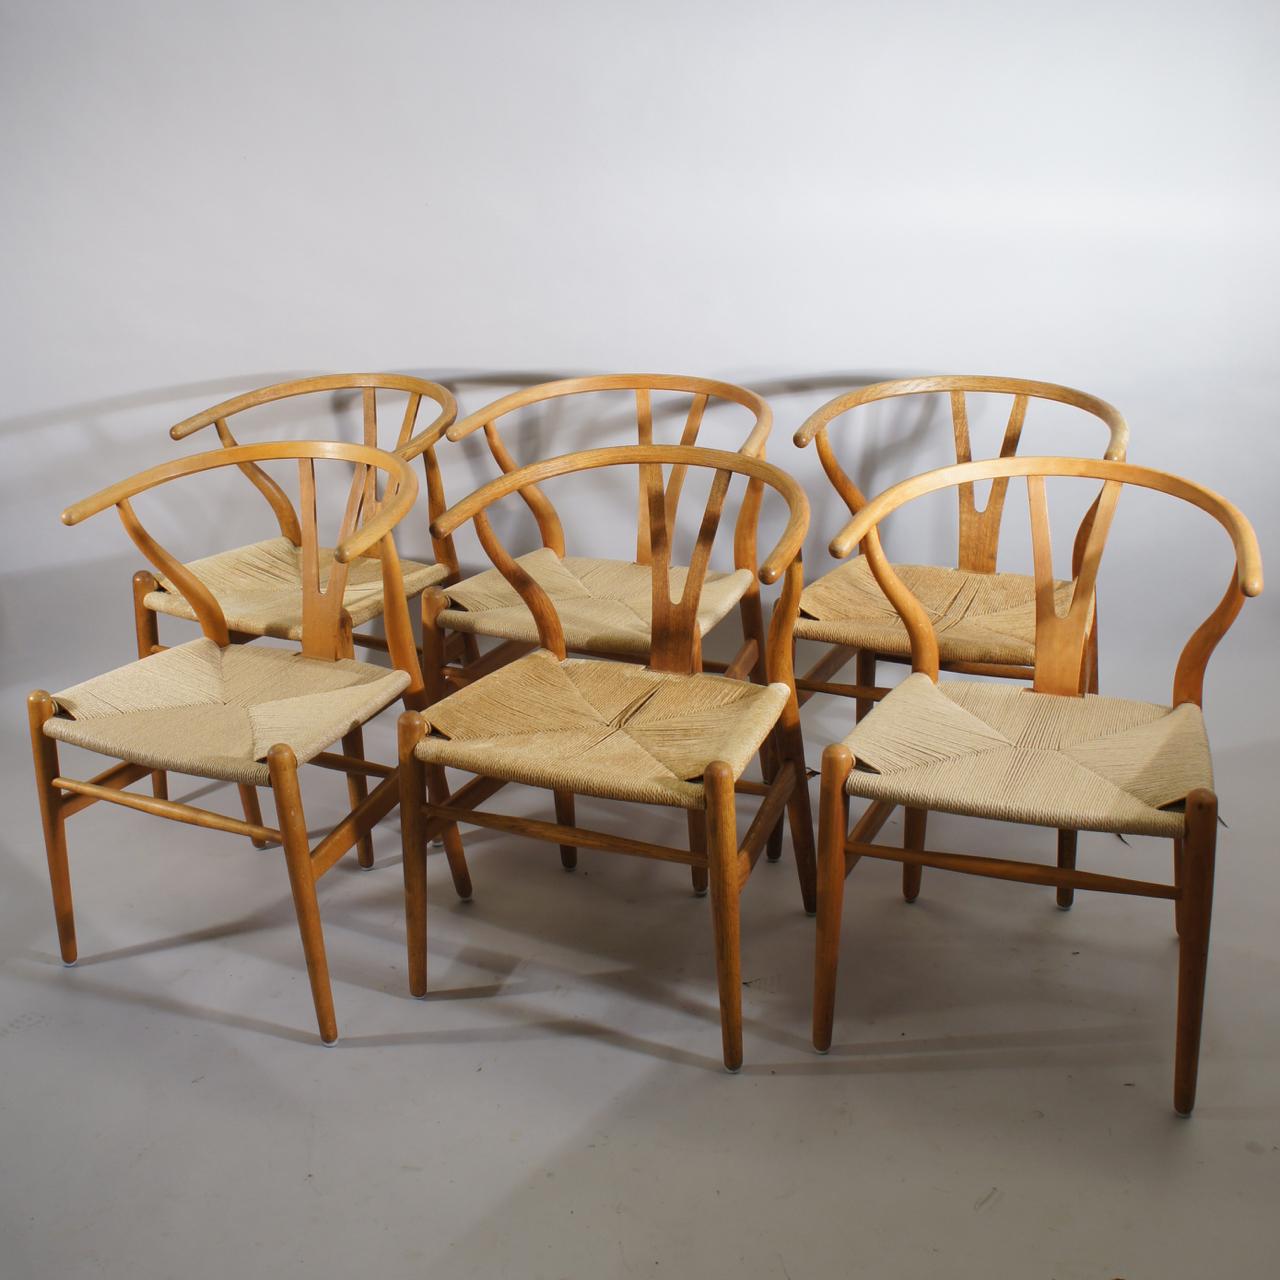 6 wishbone y chairs by hans j wegner sold wigerdals värld